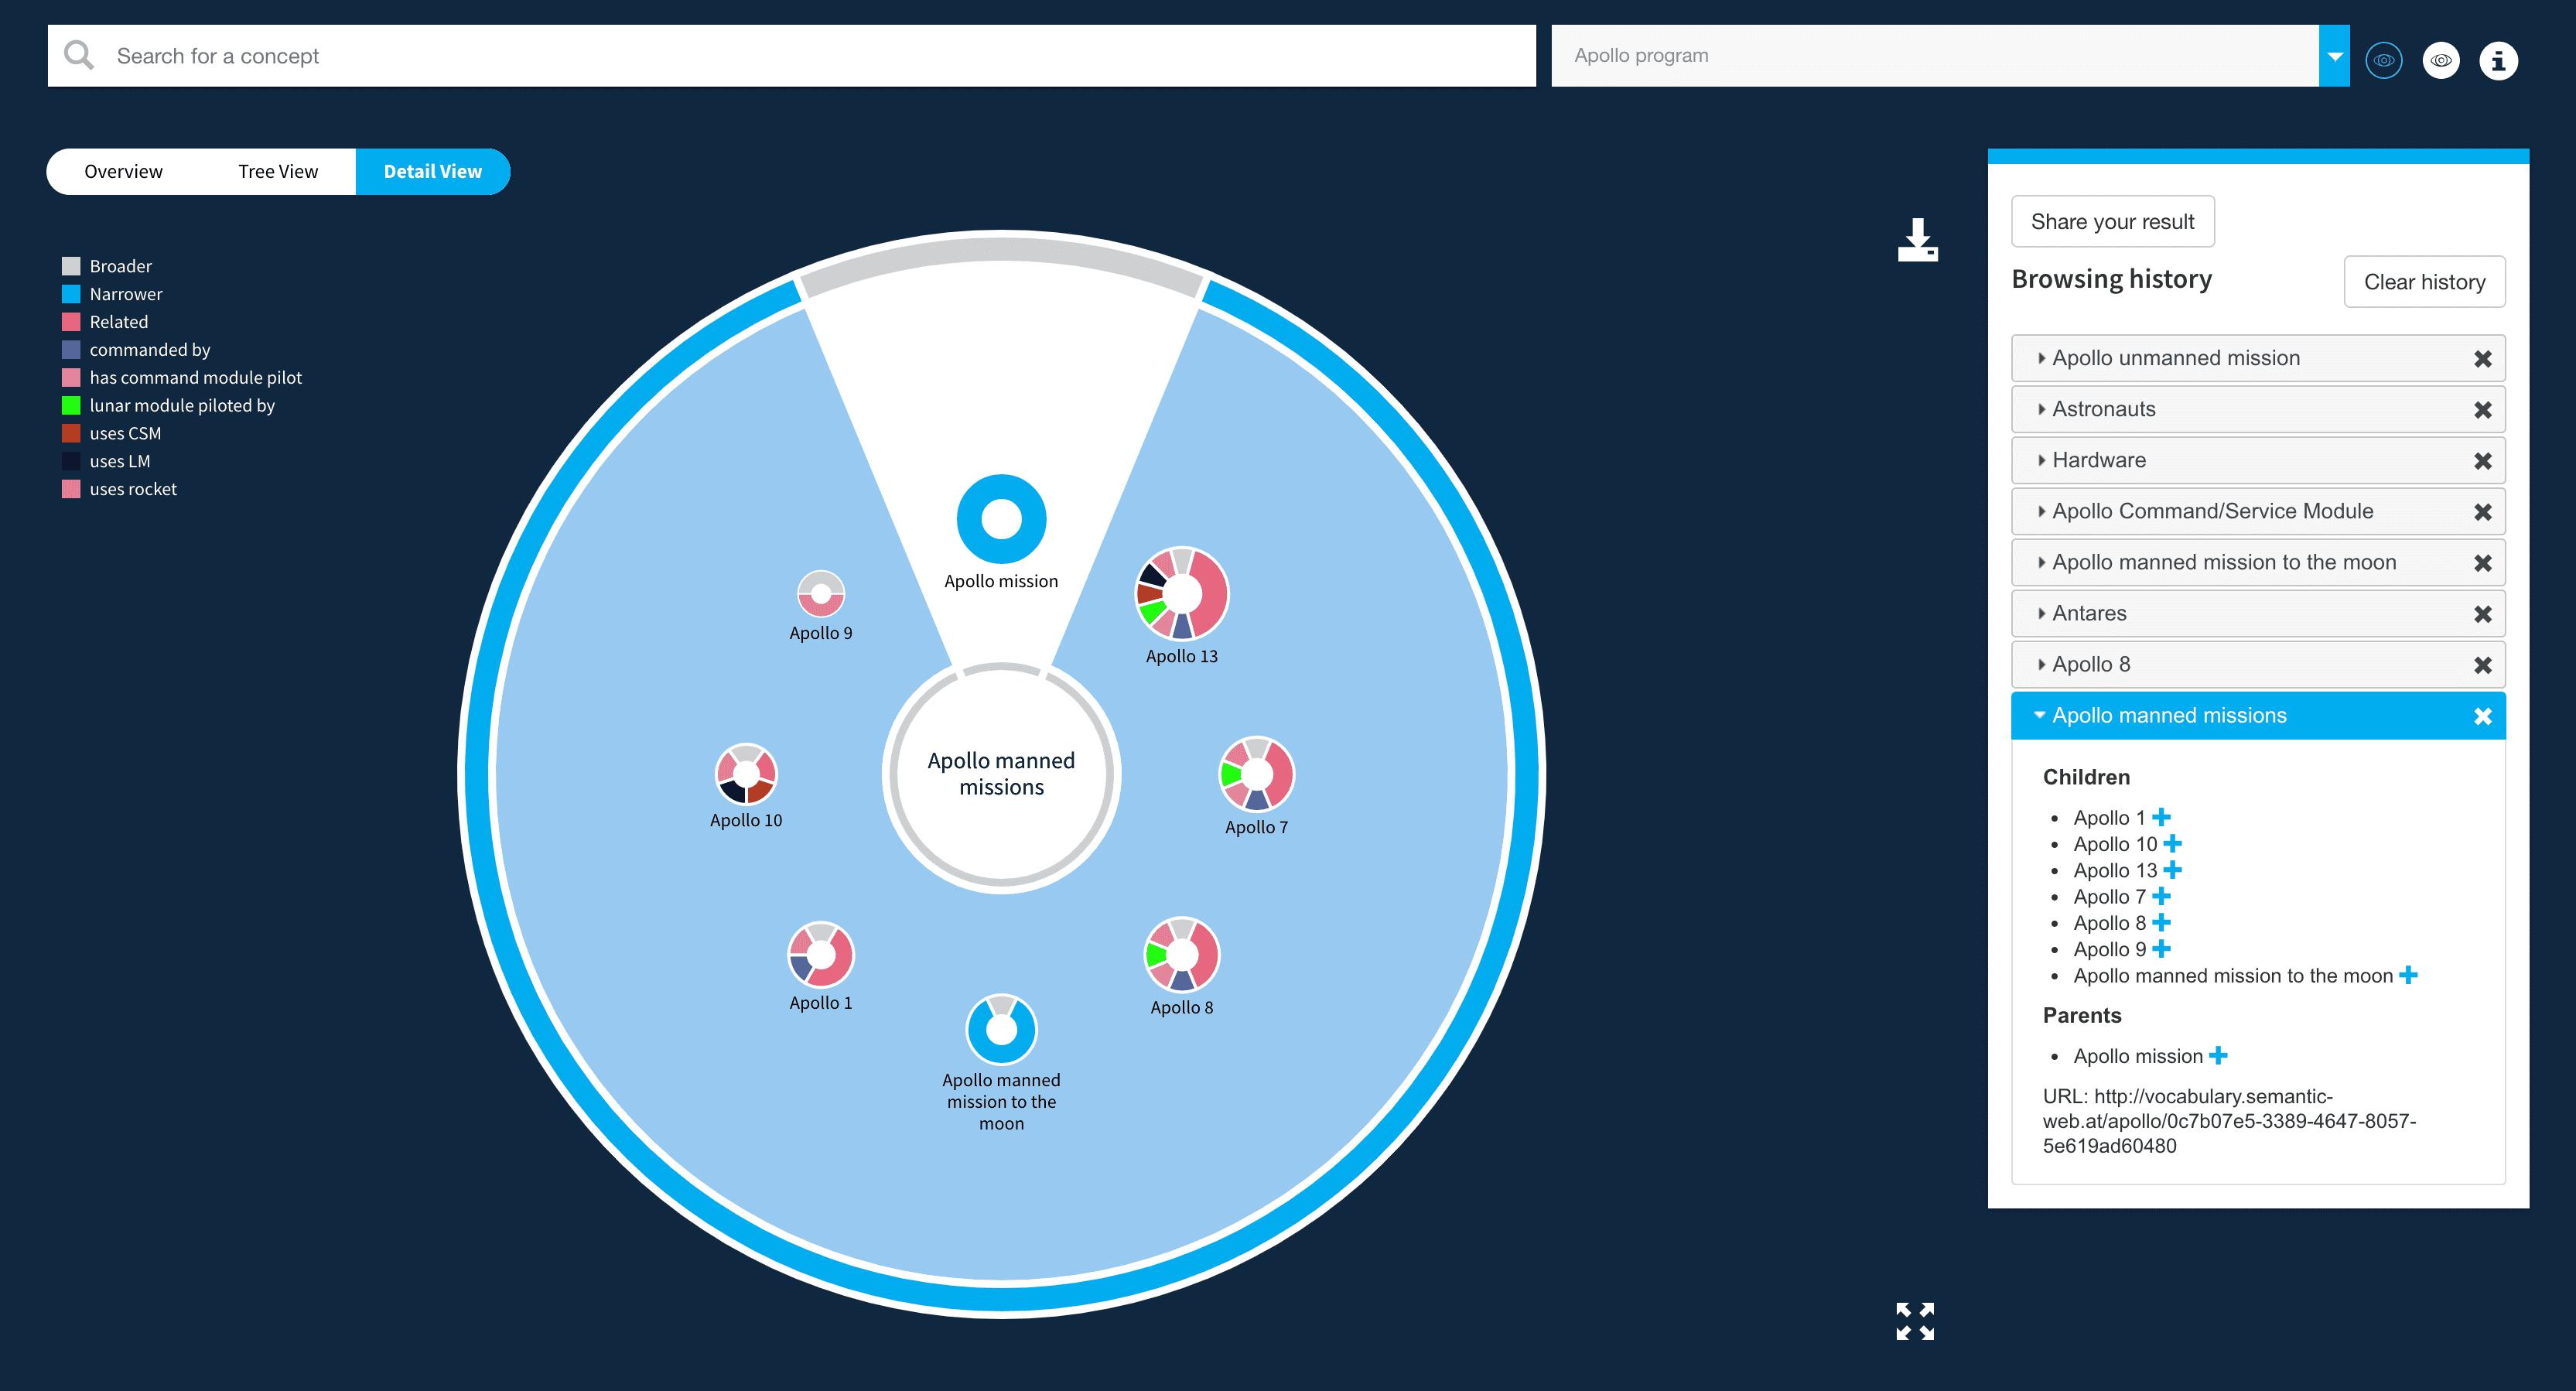 Search platform architecture image